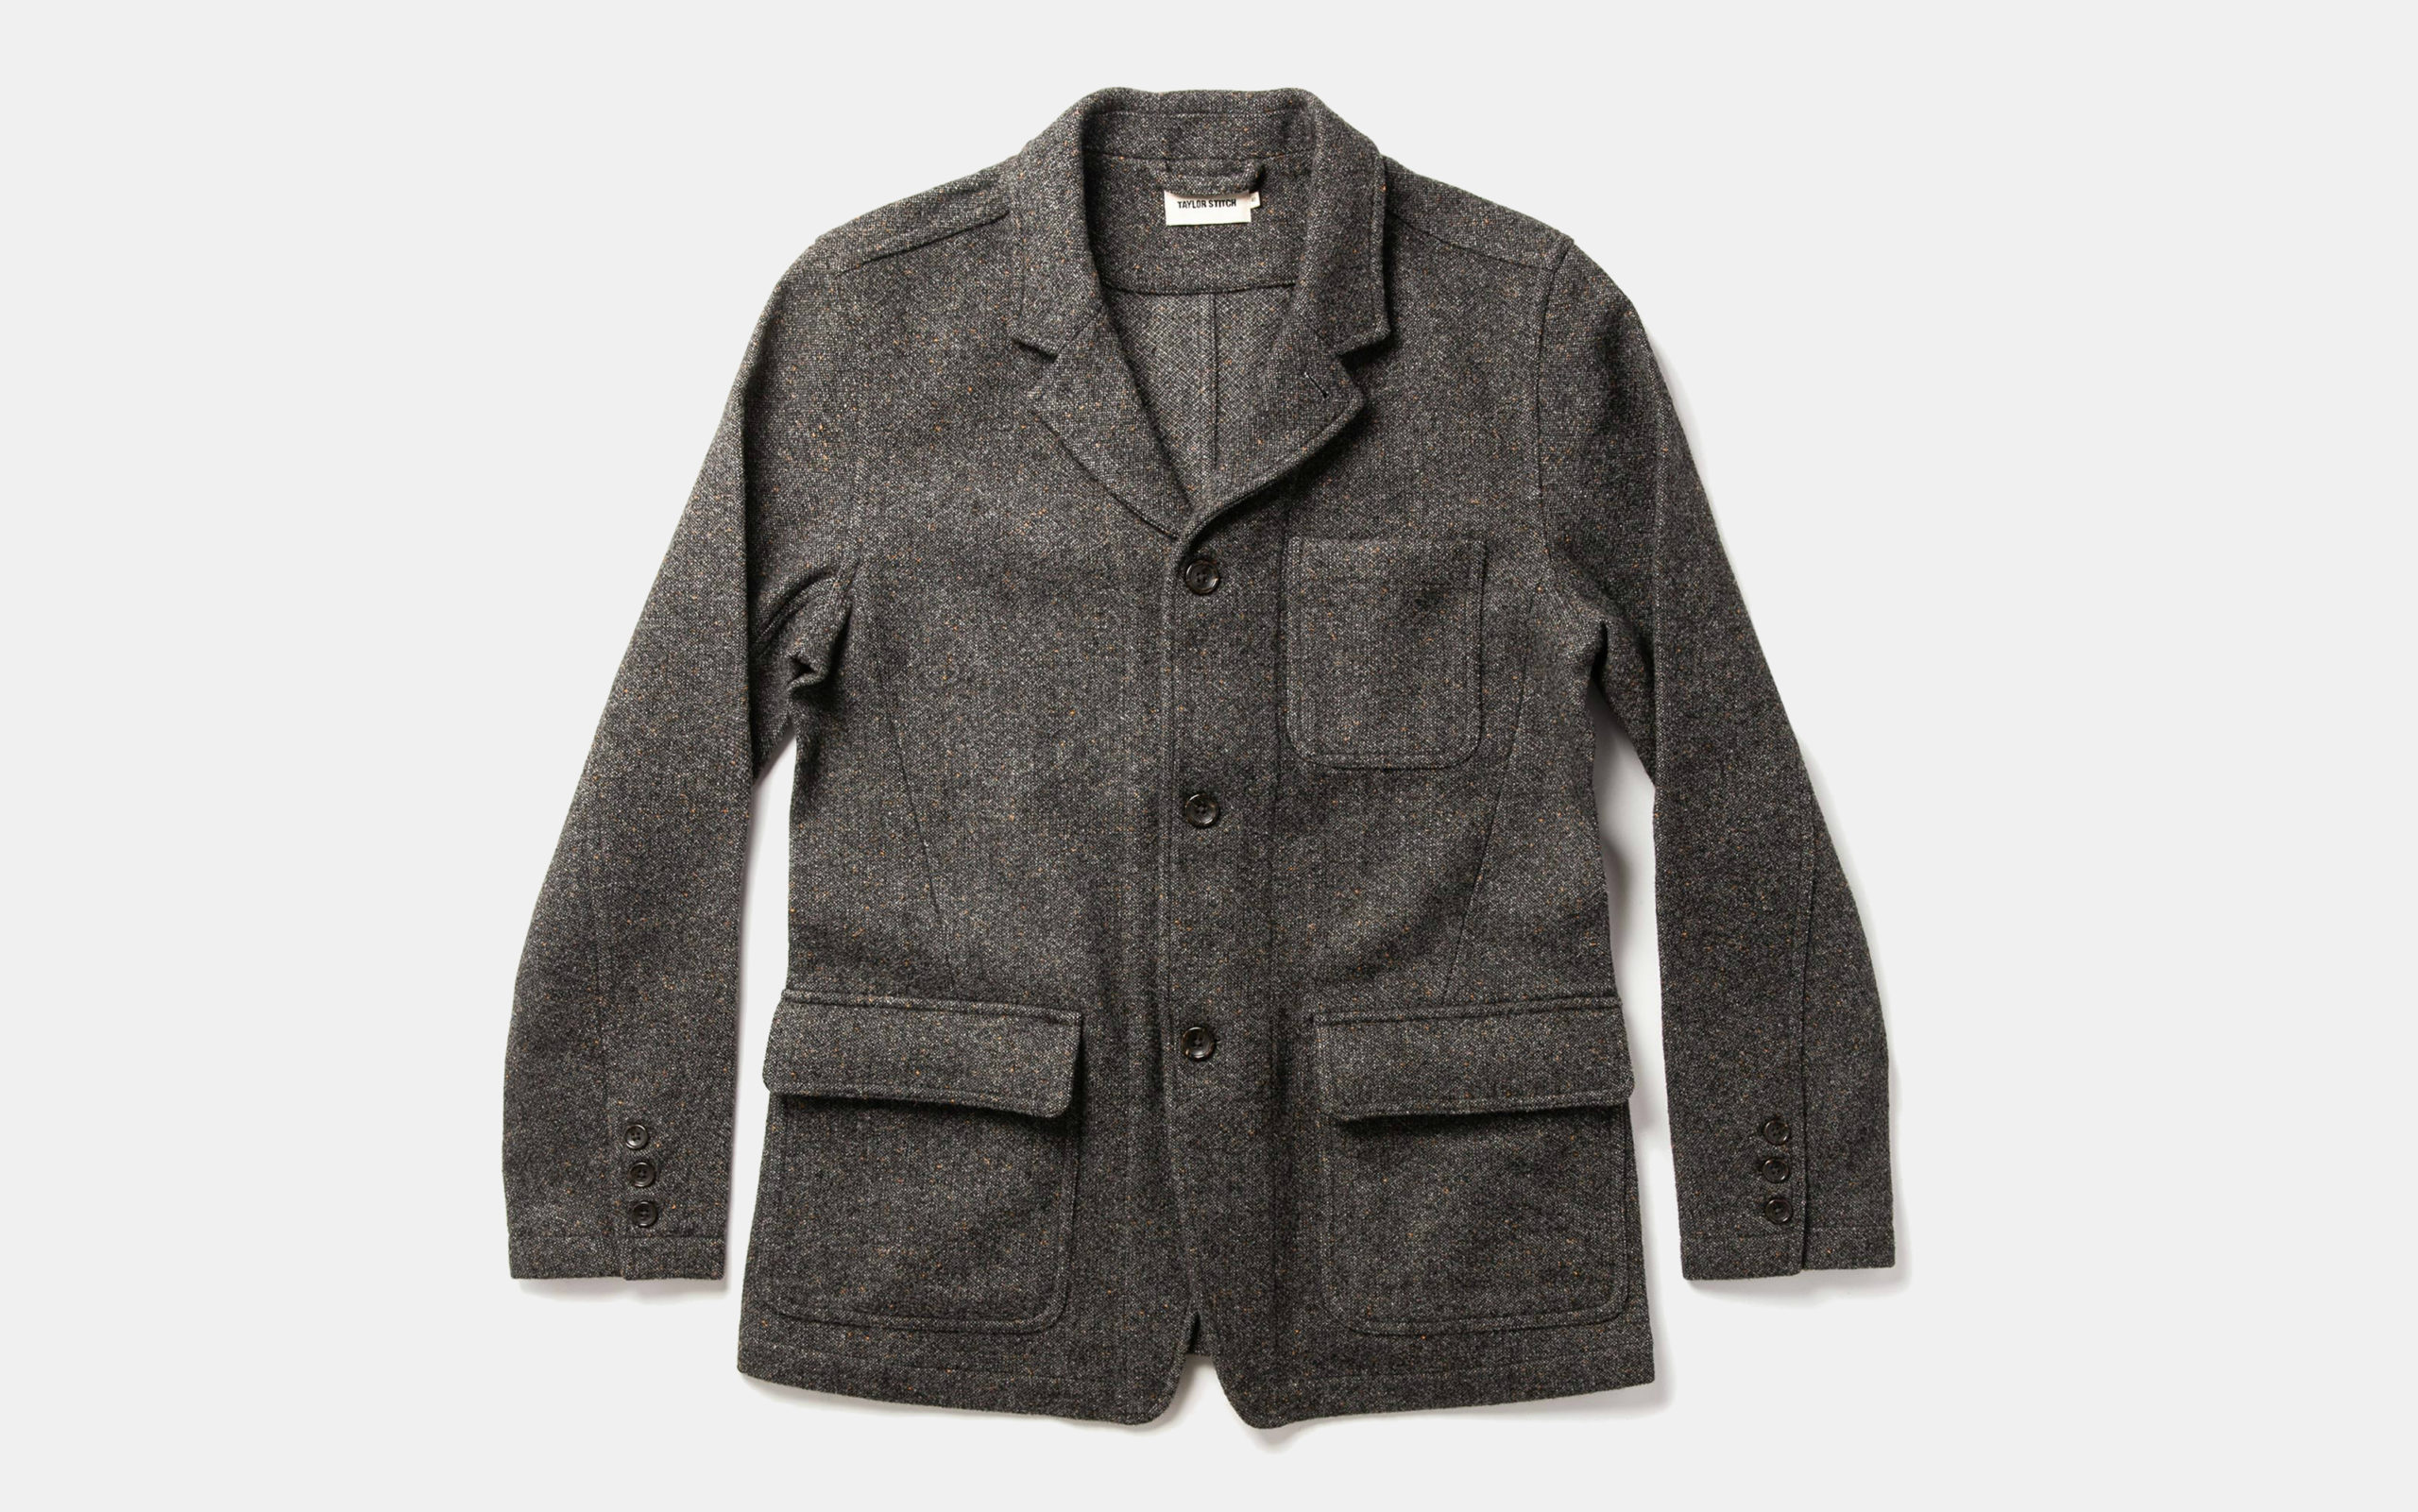 Taylor Stitch Gibson Jacket in Charcoal Birdseye Wool